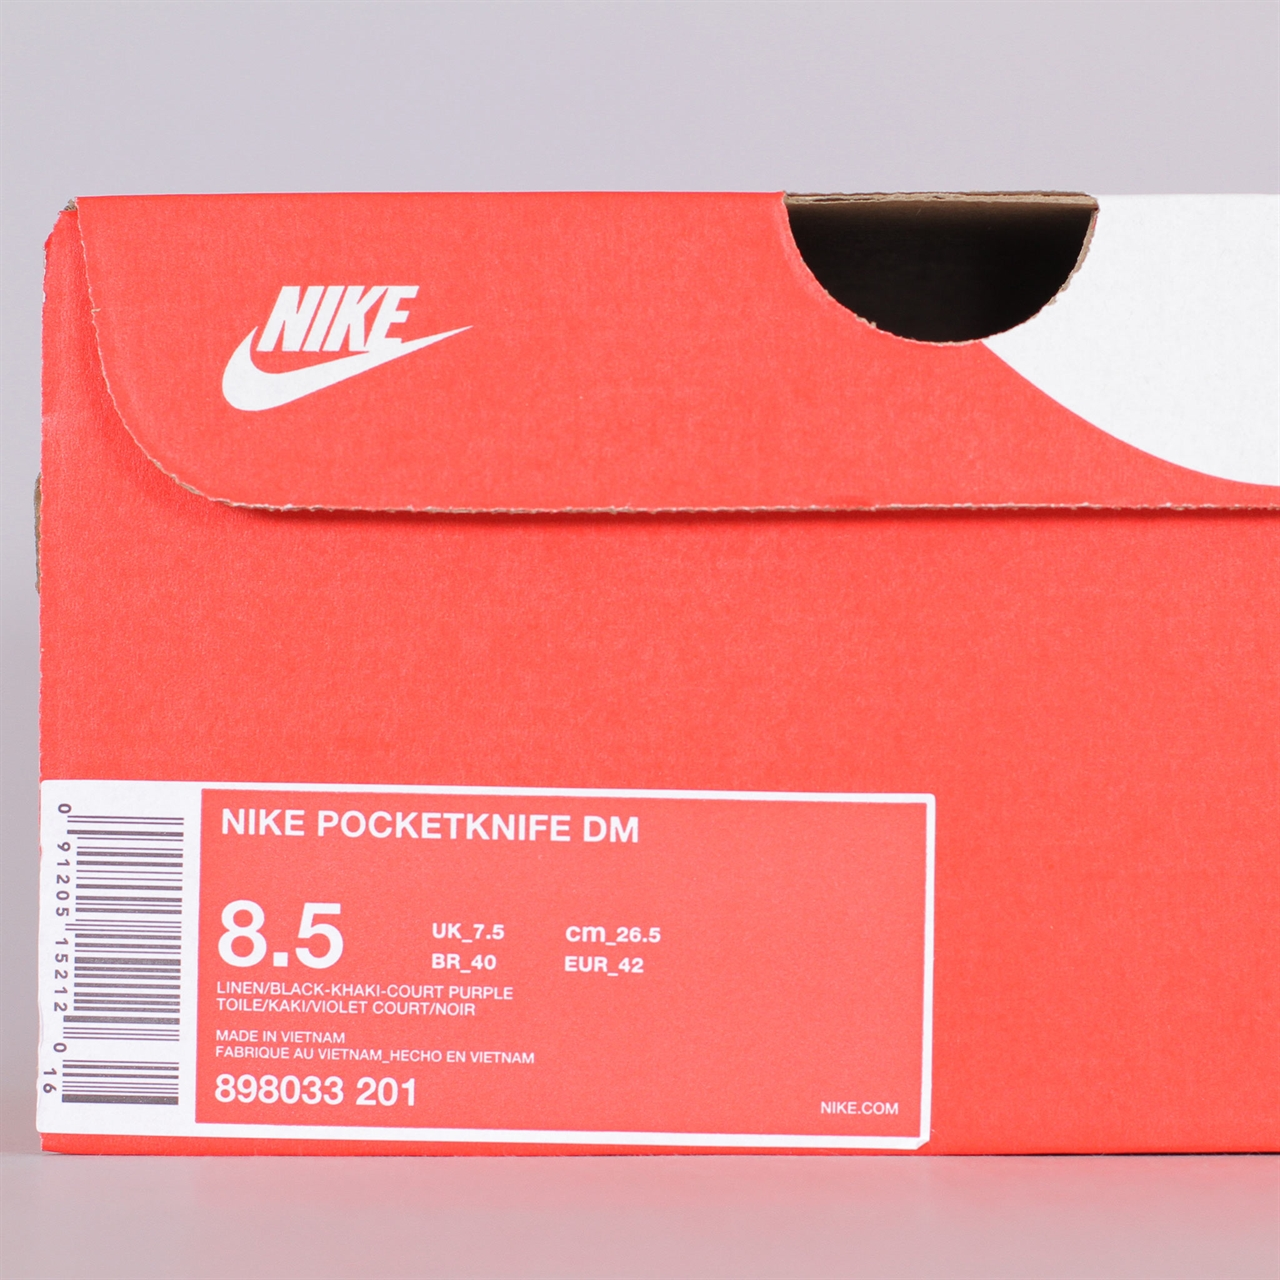 san francisco 3b702 6cc70 Nike SportswearNike Sportswear Pocket Knife DM (898033-201). 1